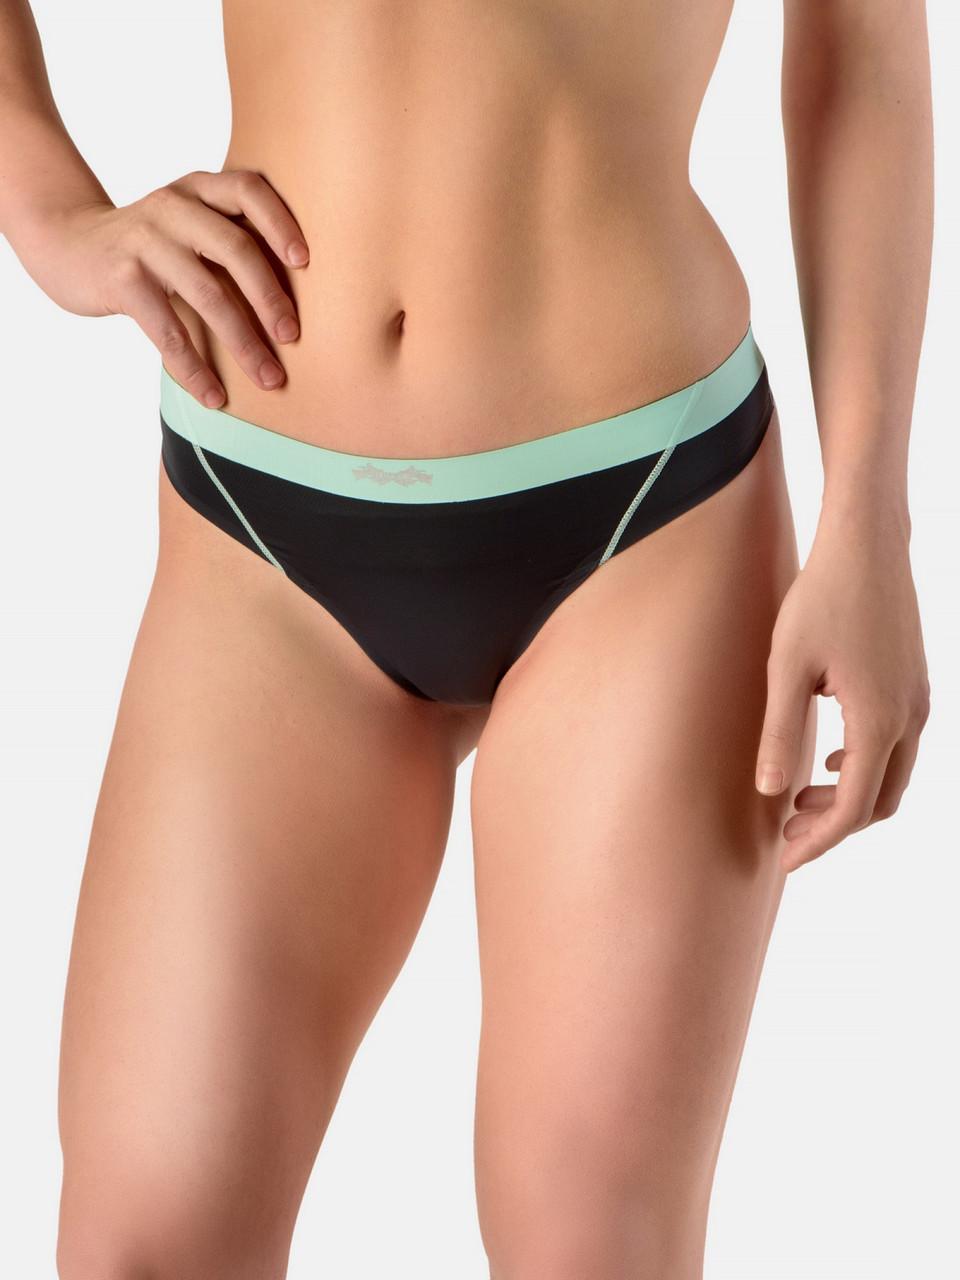 Женские трусы спортивные Peresvit Performance Women's Thongs Graphite - Mint